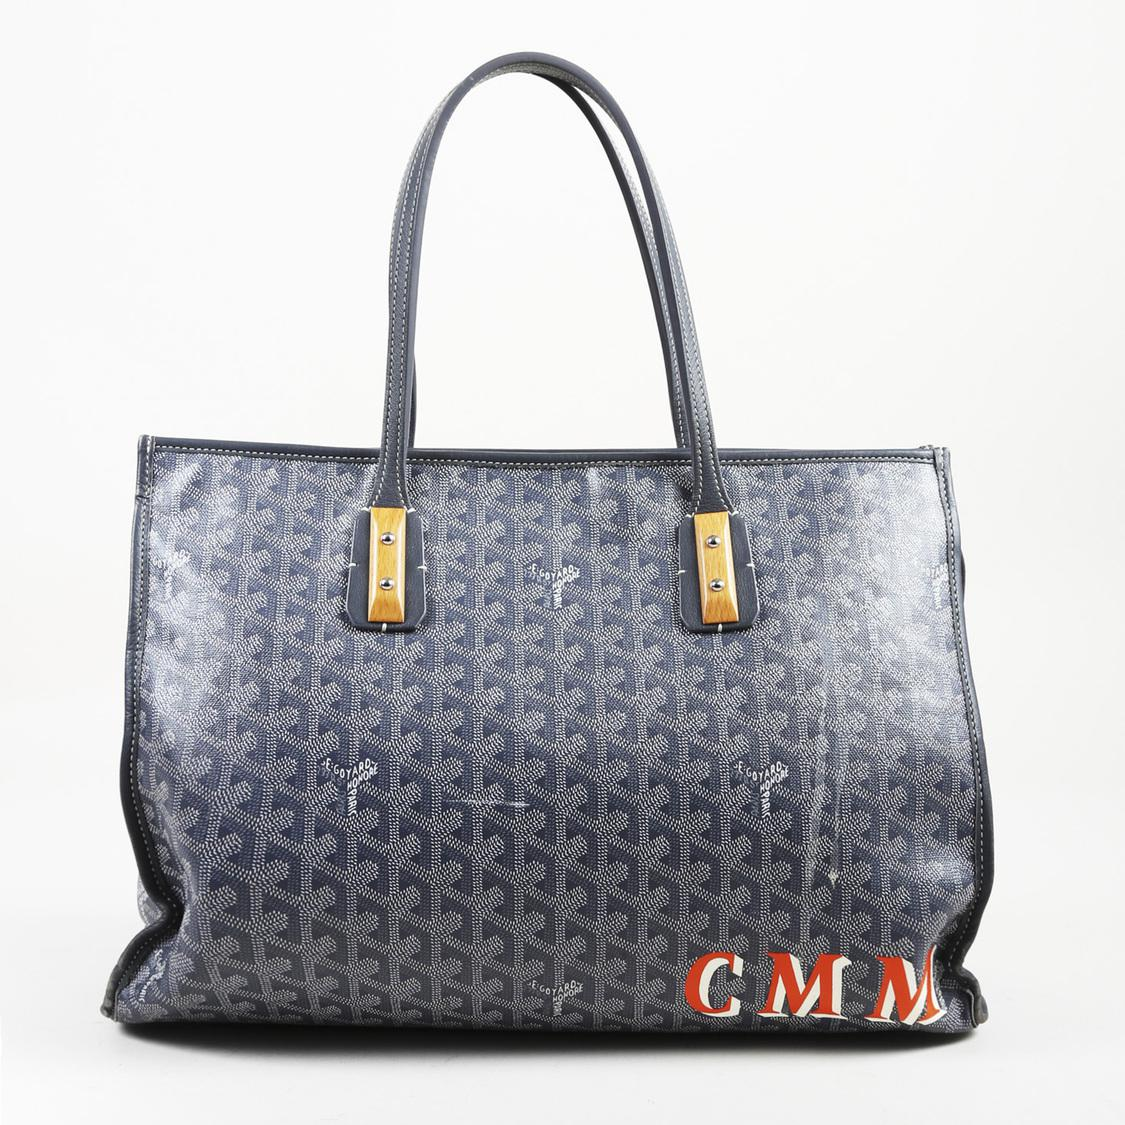 3940a9bd9000 Lyst - Goyard Pre-owned Marquises Blue Cloth Handbags in Blue - Save ...